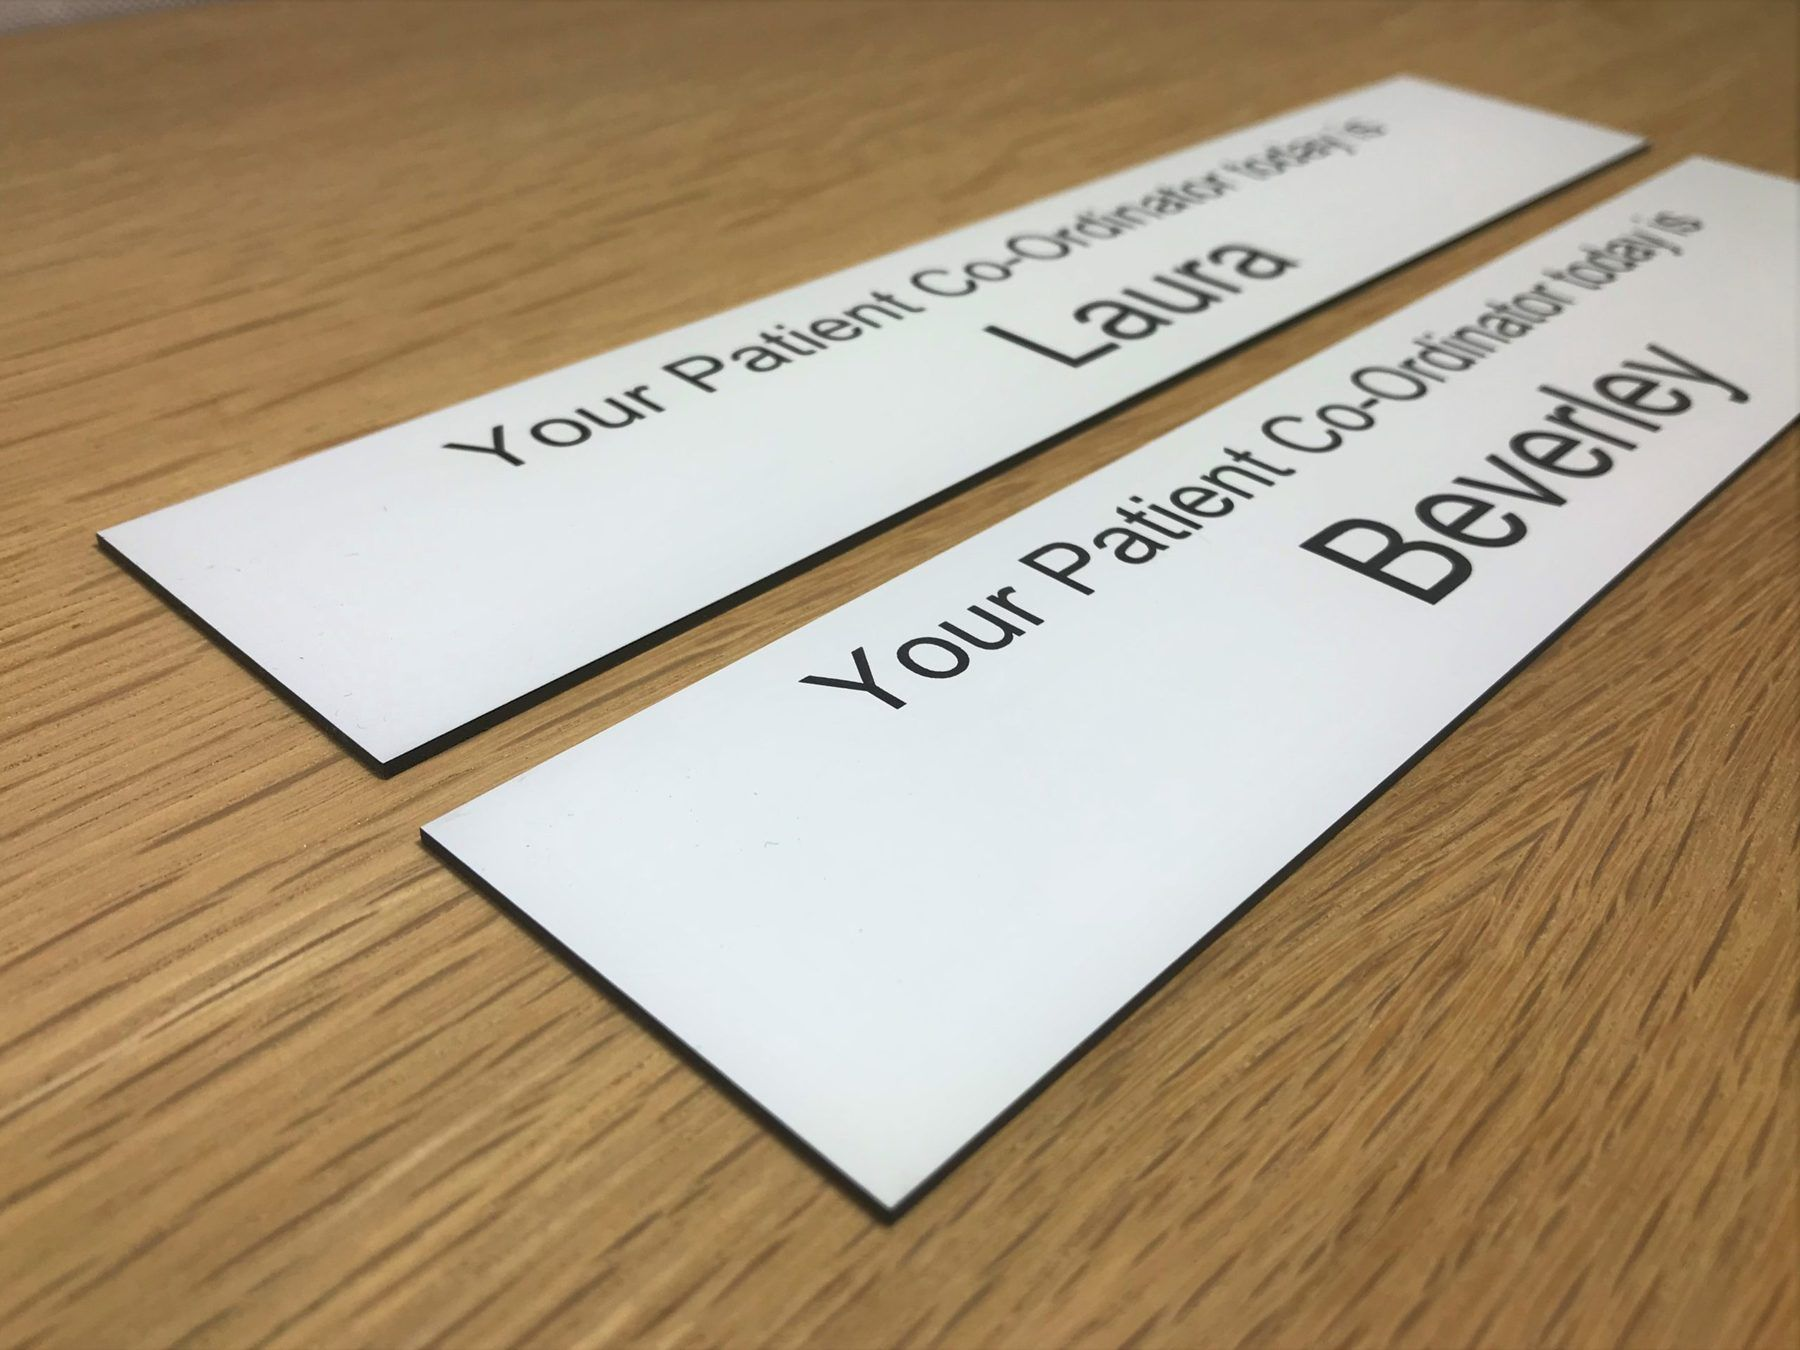 Laser engraved plastic nameplate inserts